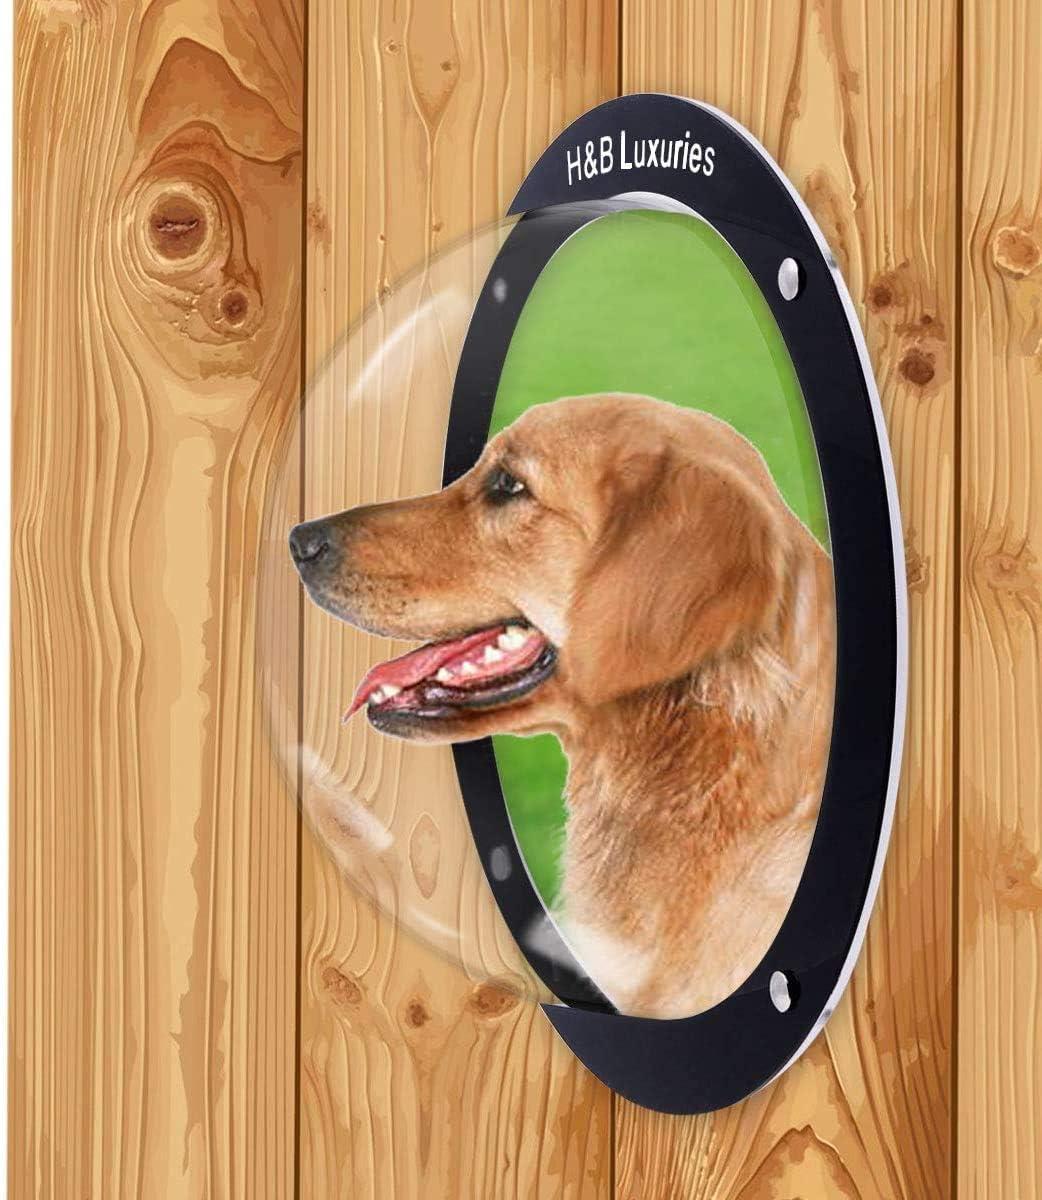 Dog Patch Blocks Beagle German Shepard Canine Beauty Faithful Companion Valance